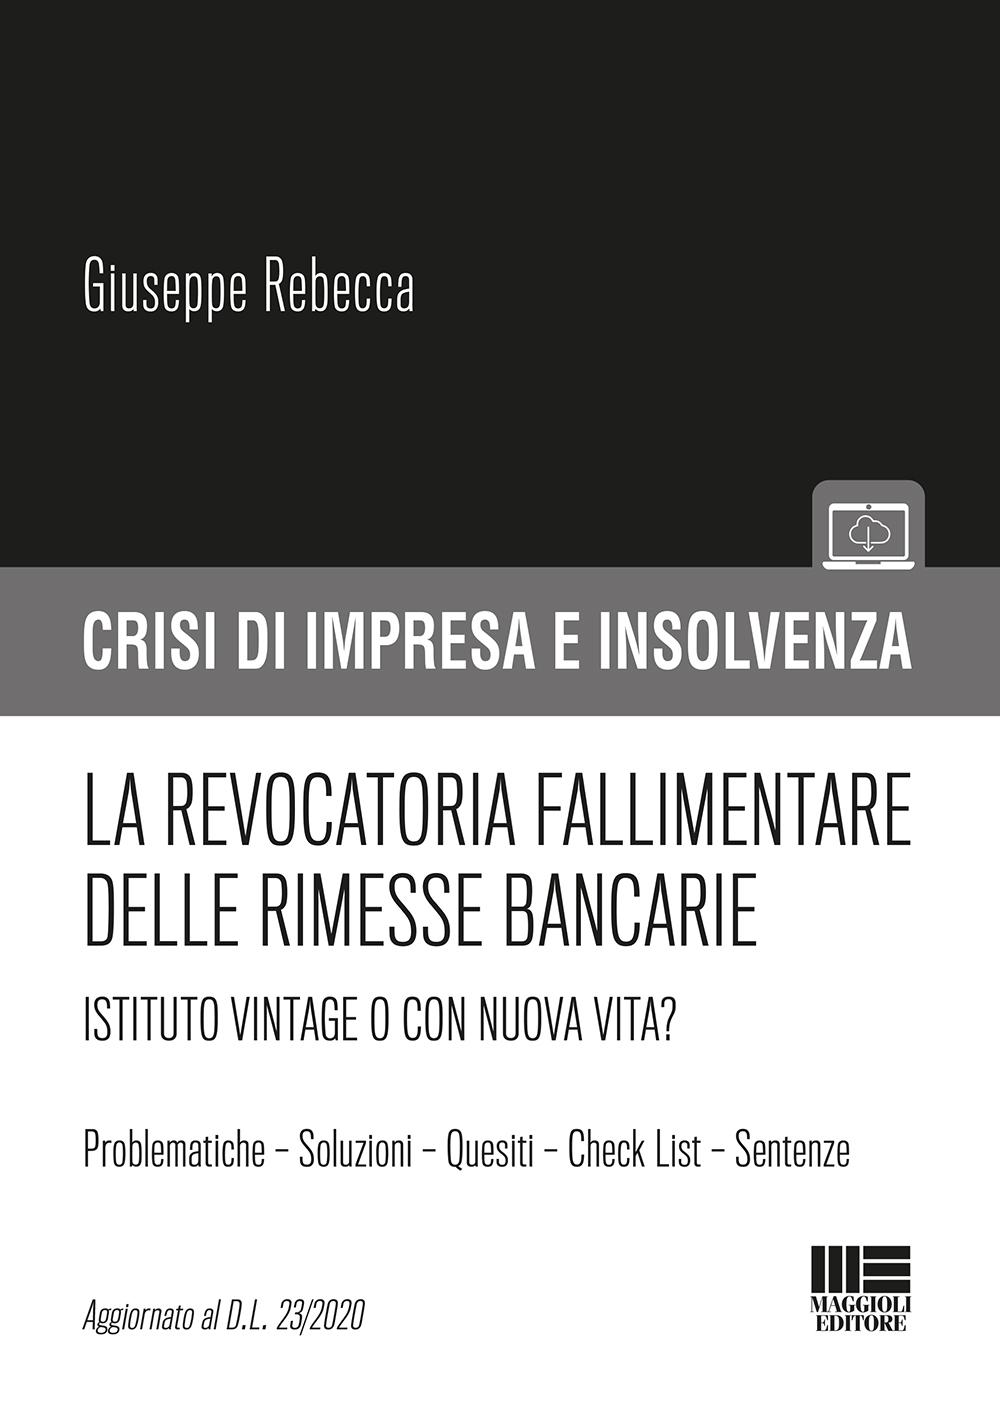 Giuseppe Rebecca